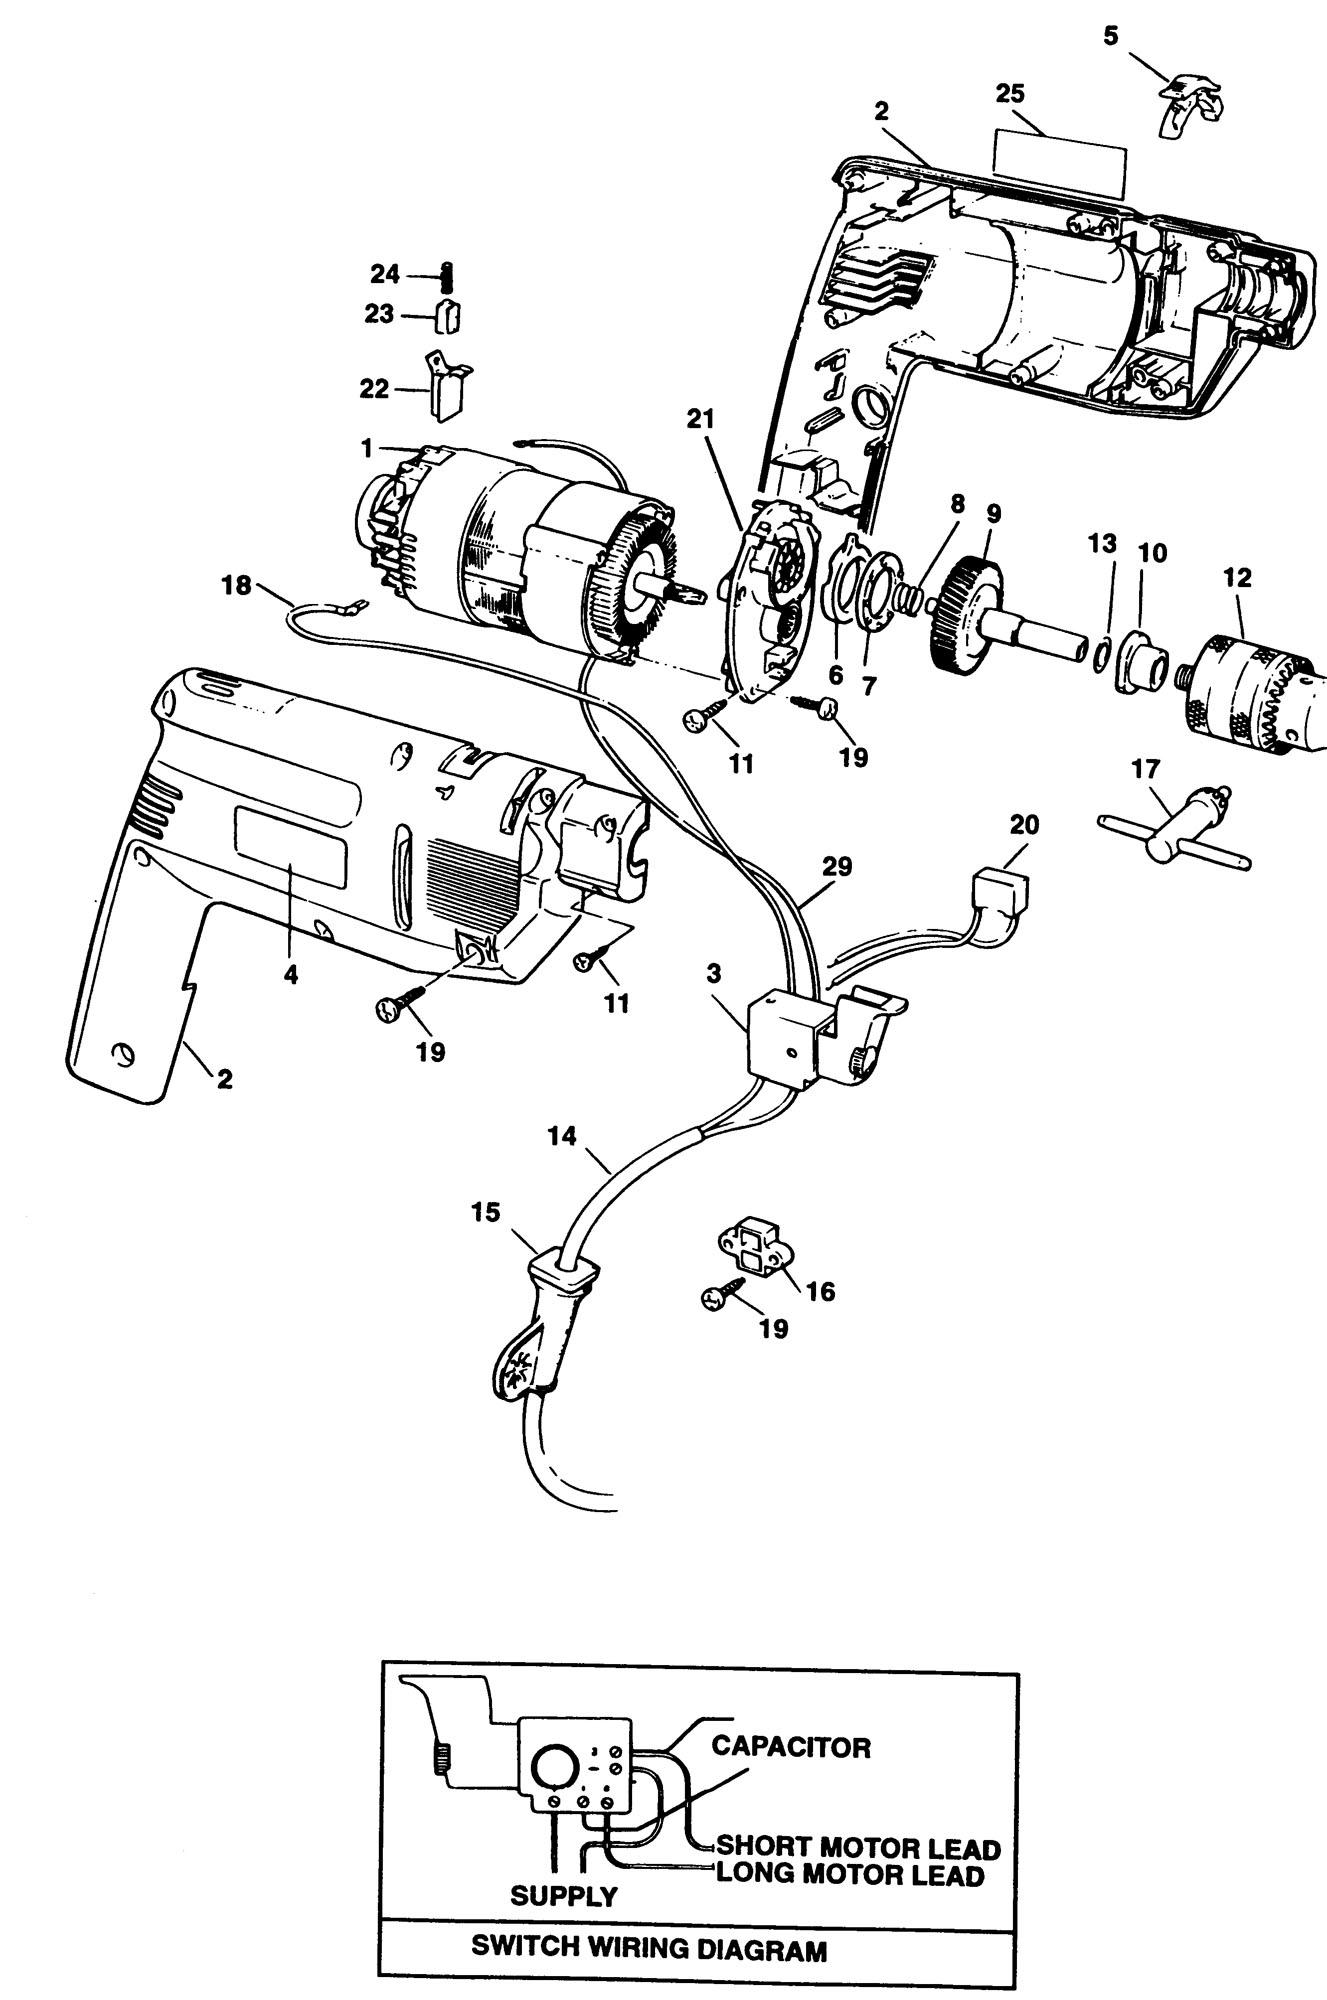 Spares for Black & Decker Bd143v Hammer Drill (type 1